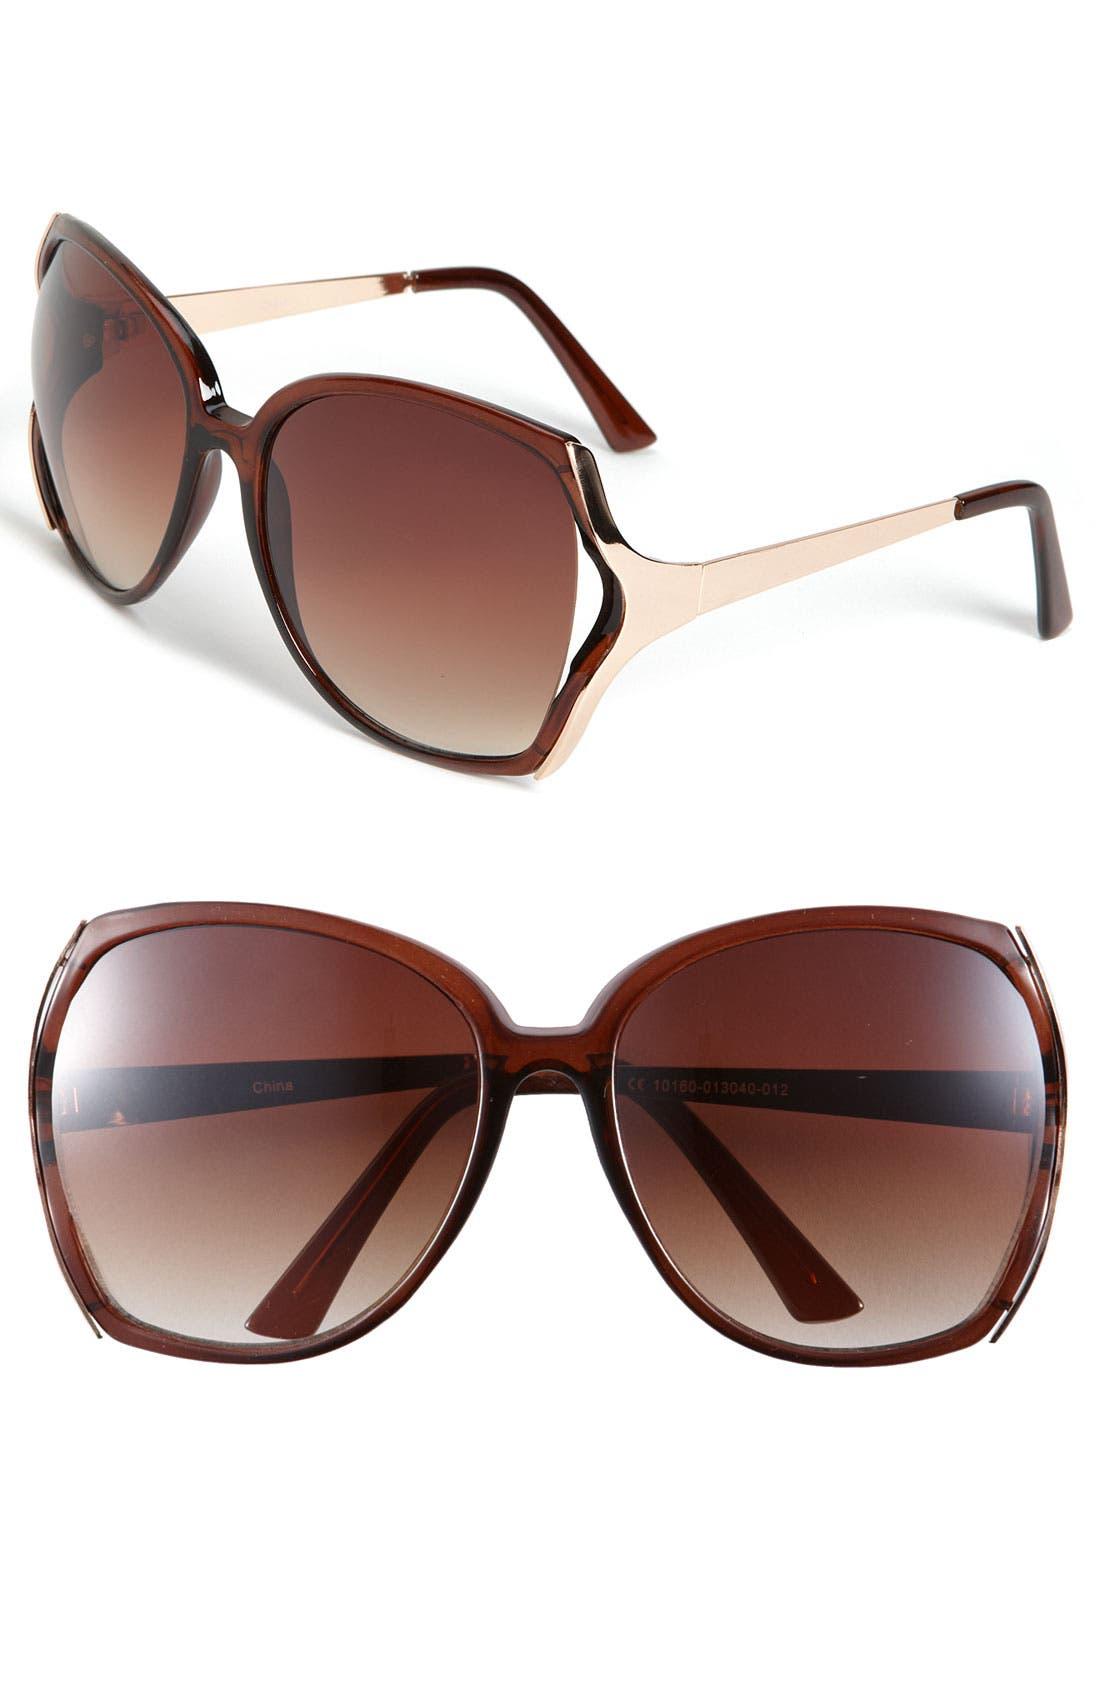 Alternate Image 1 Selected - Icon Eyewear 'Paris' Sunglasses (2 for $20)